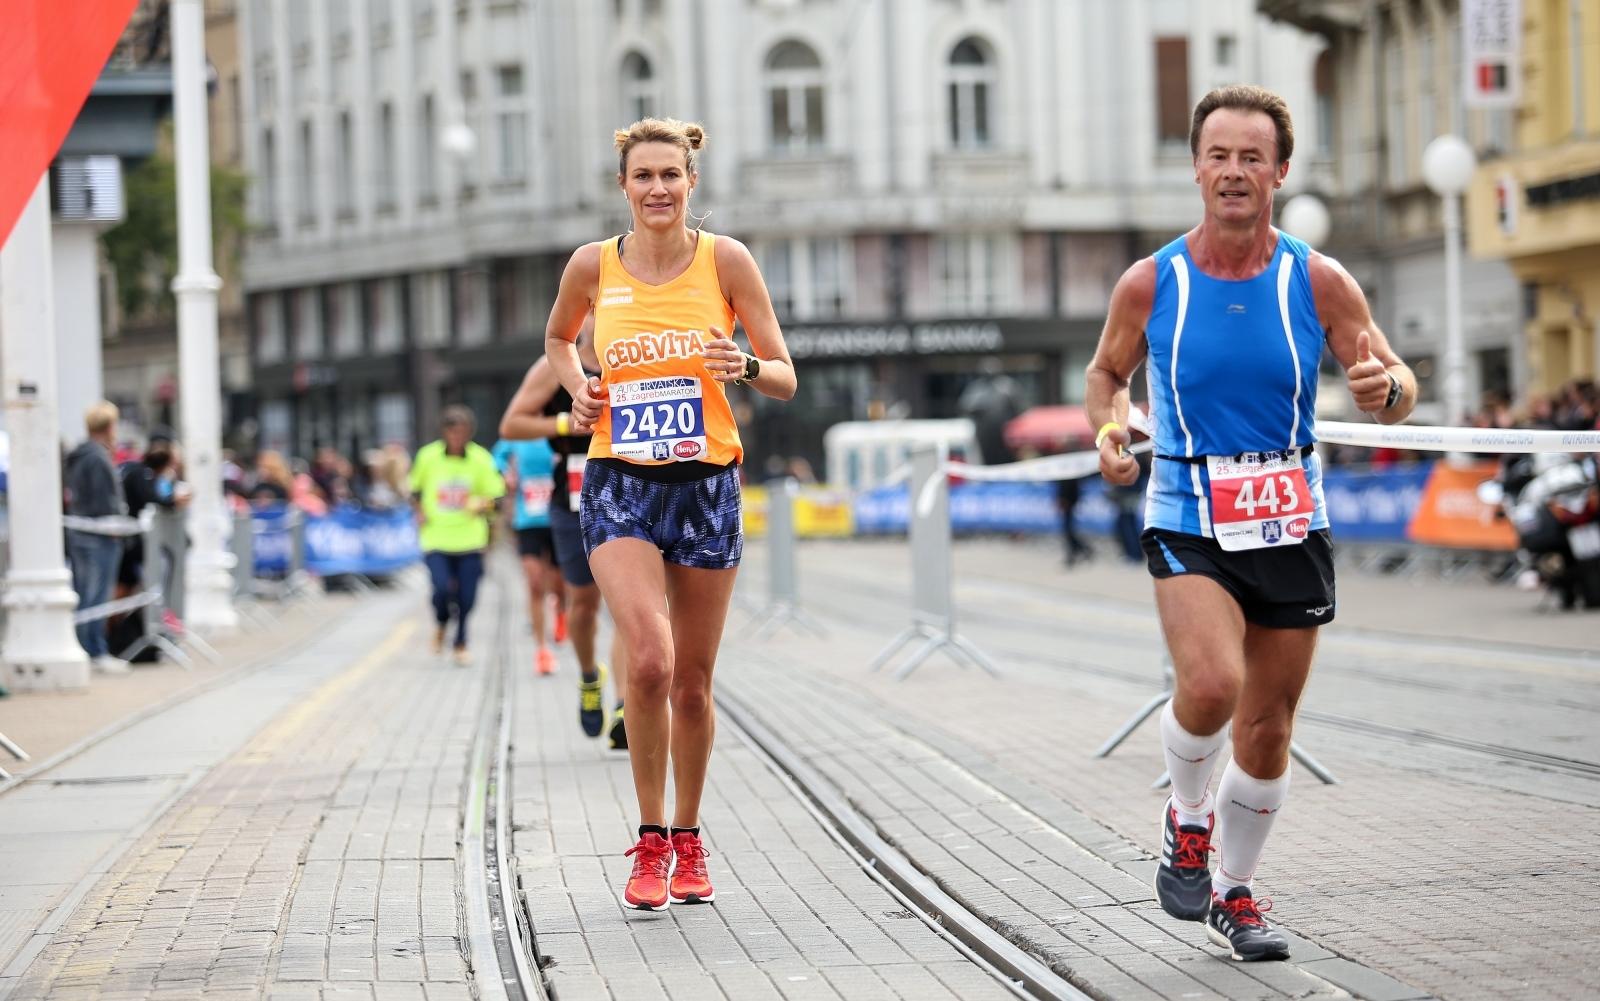 09.10.2016., Zagreb - 25. Zagrebacki maraton, polumaraton i utrka gradjana na 5km. Lada Tedeschi Fiorio.  Photo: Petar Glebov/PIXSELL